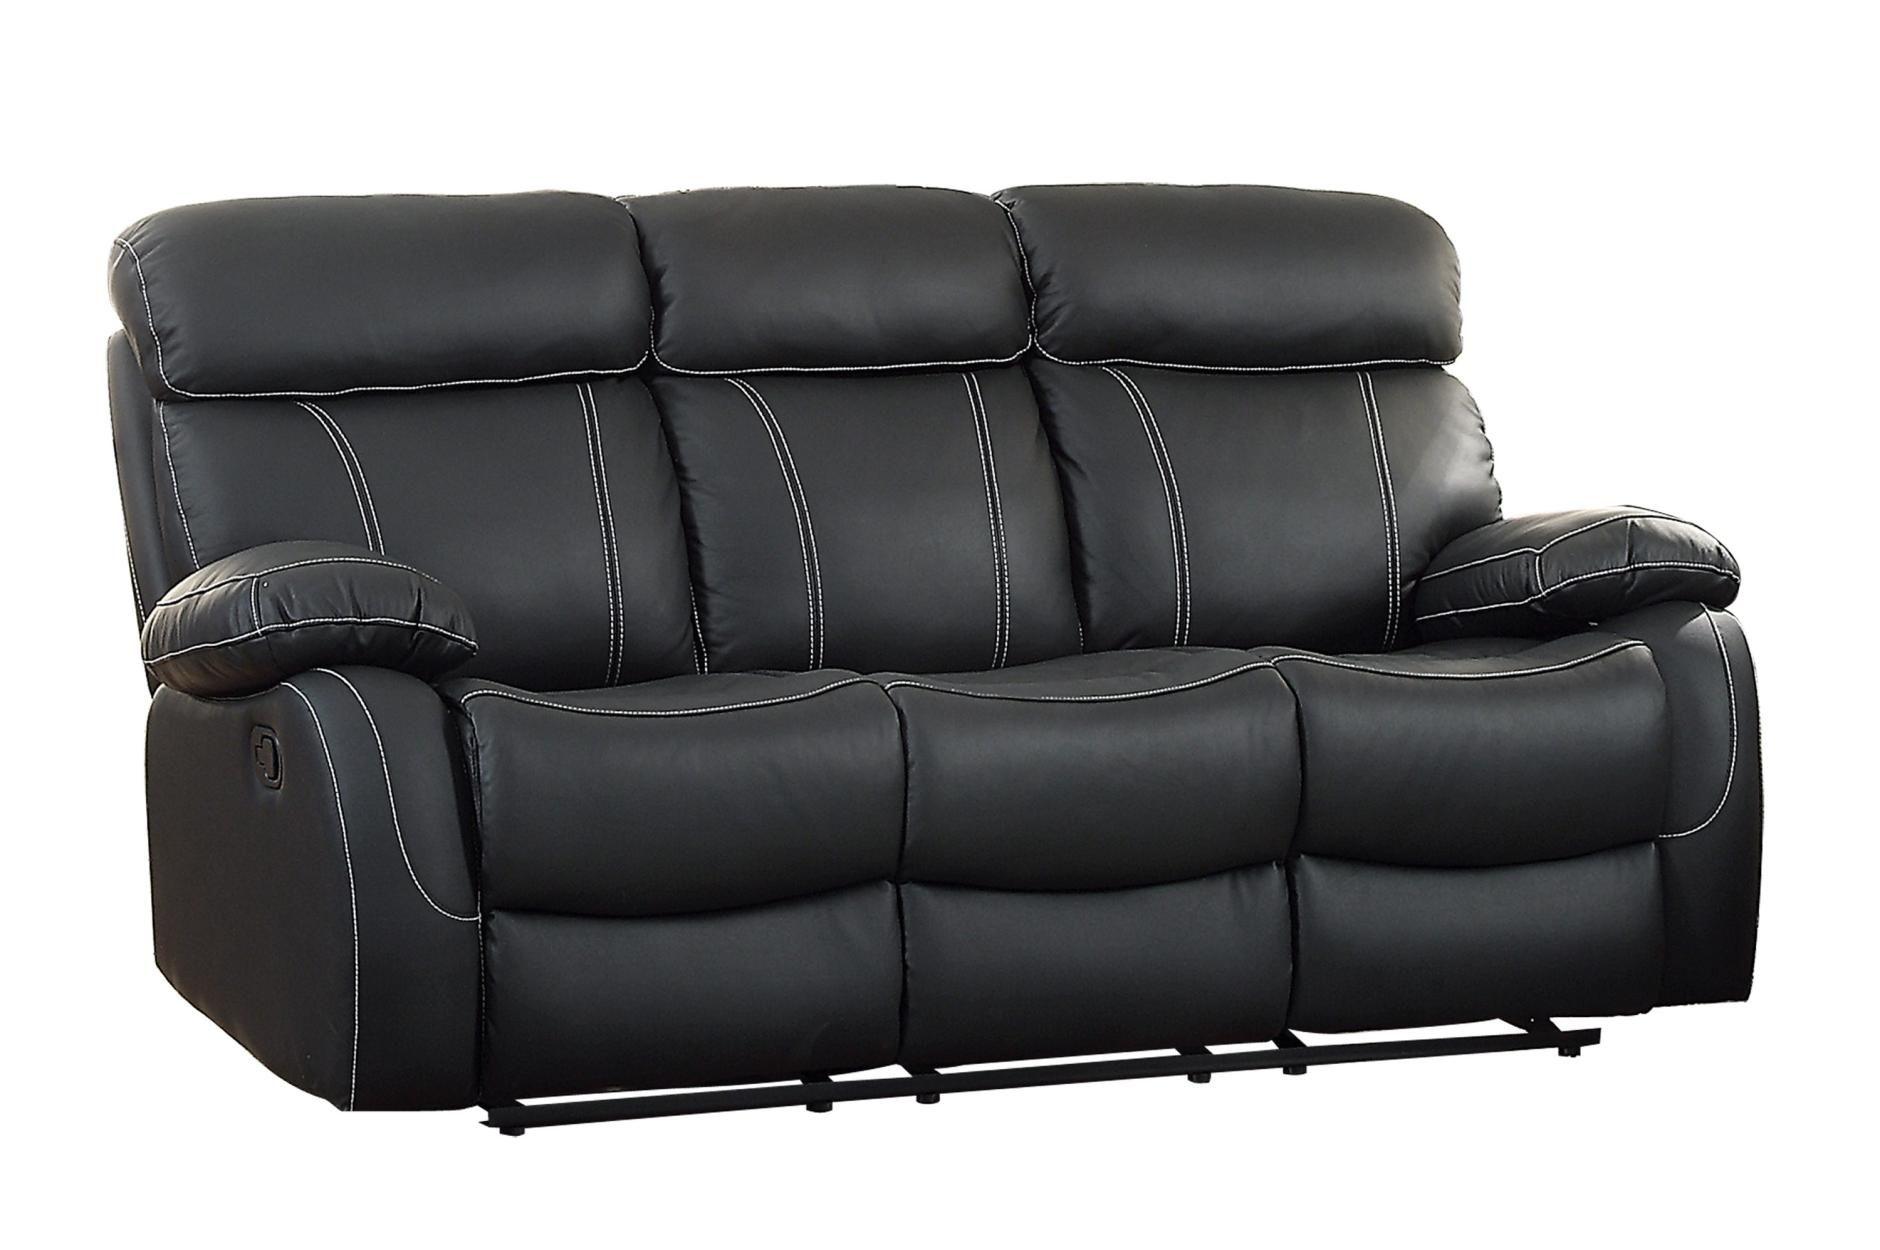 Pendu Leather Leatherette Double Reclining Sofa Reclining Sofa